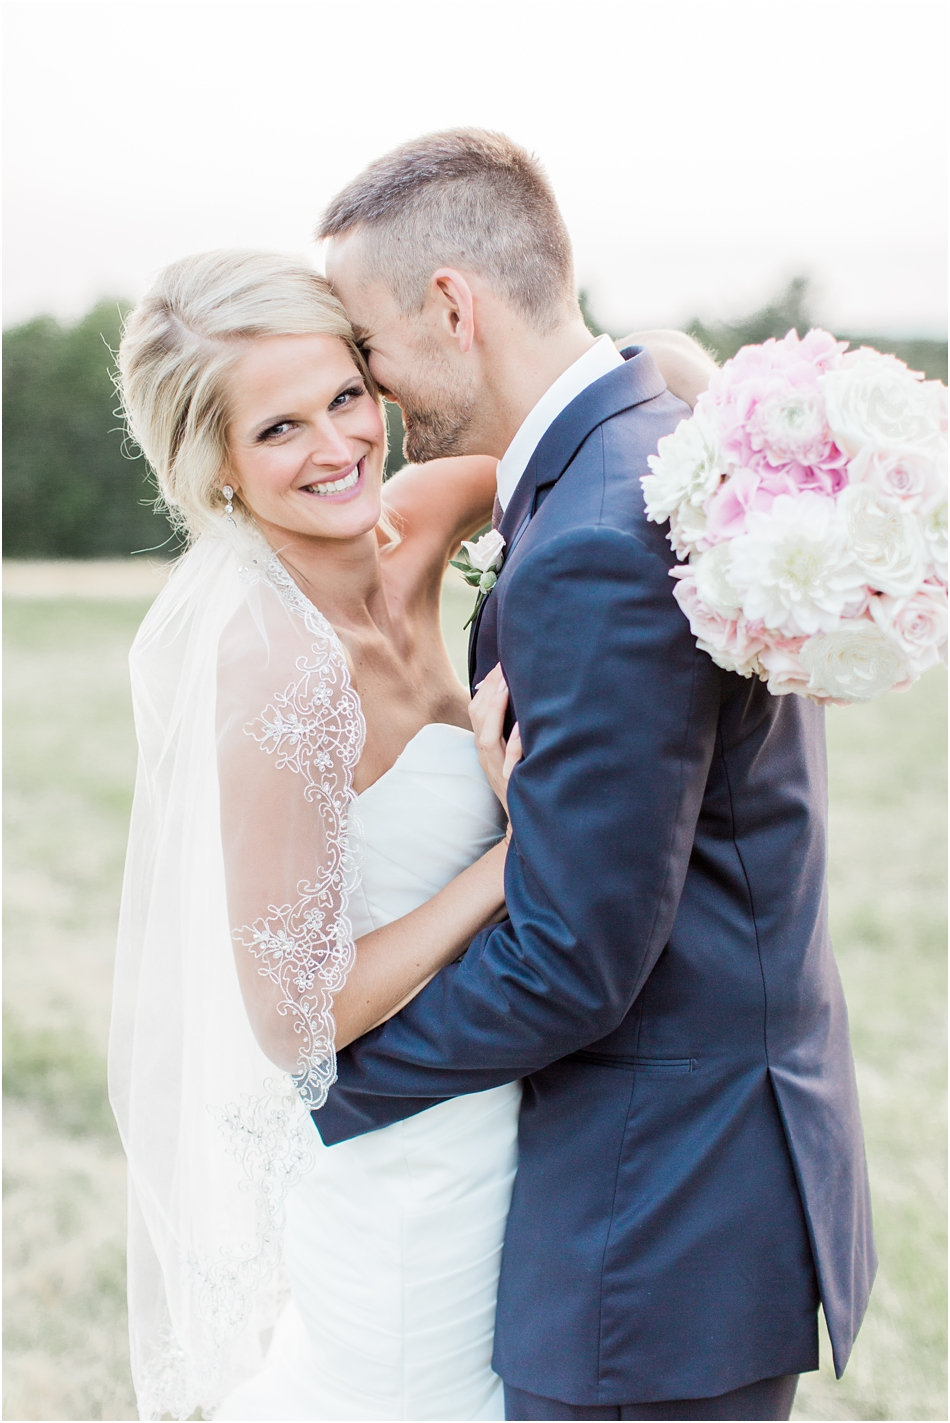 harrington_farm_leominster_sandra_jack_cape_cod_boston_new_england_wedding_photographer_Meredith_Jane_Photography_photo_2300.jpg